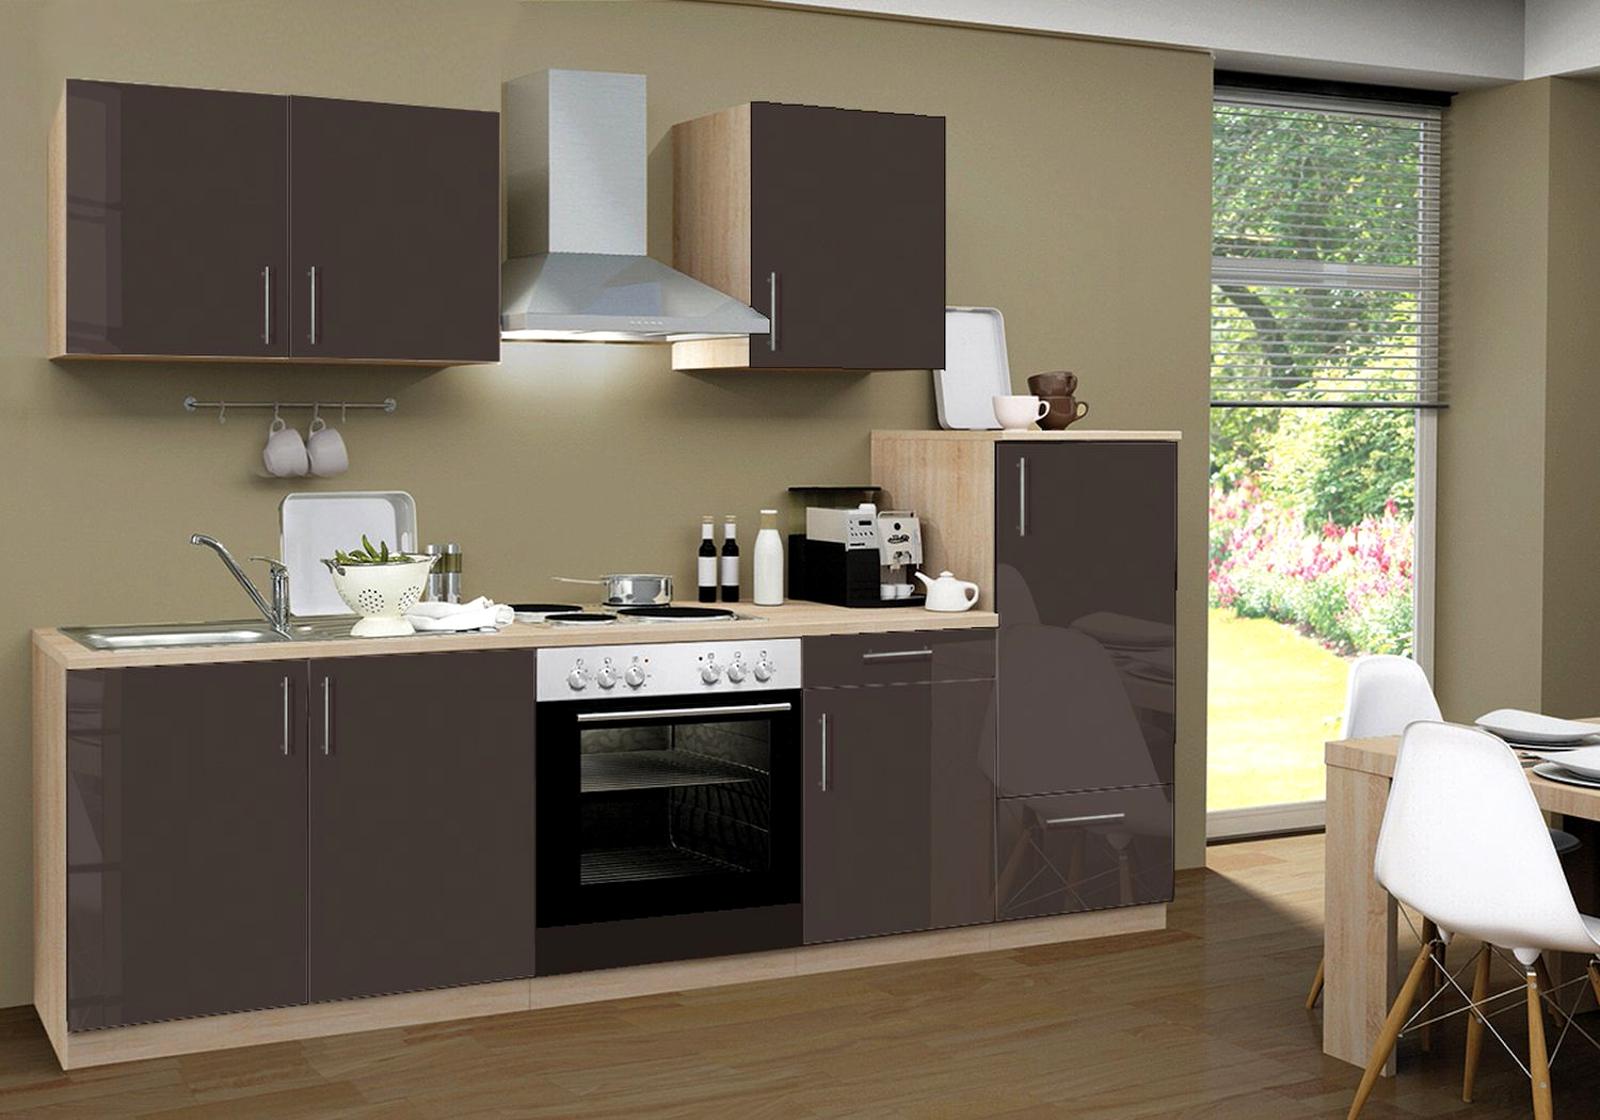 einbauk che premium inkl e ger te 270 cm grau. Black Bedroom Furniture Sets. Home Design Ideas